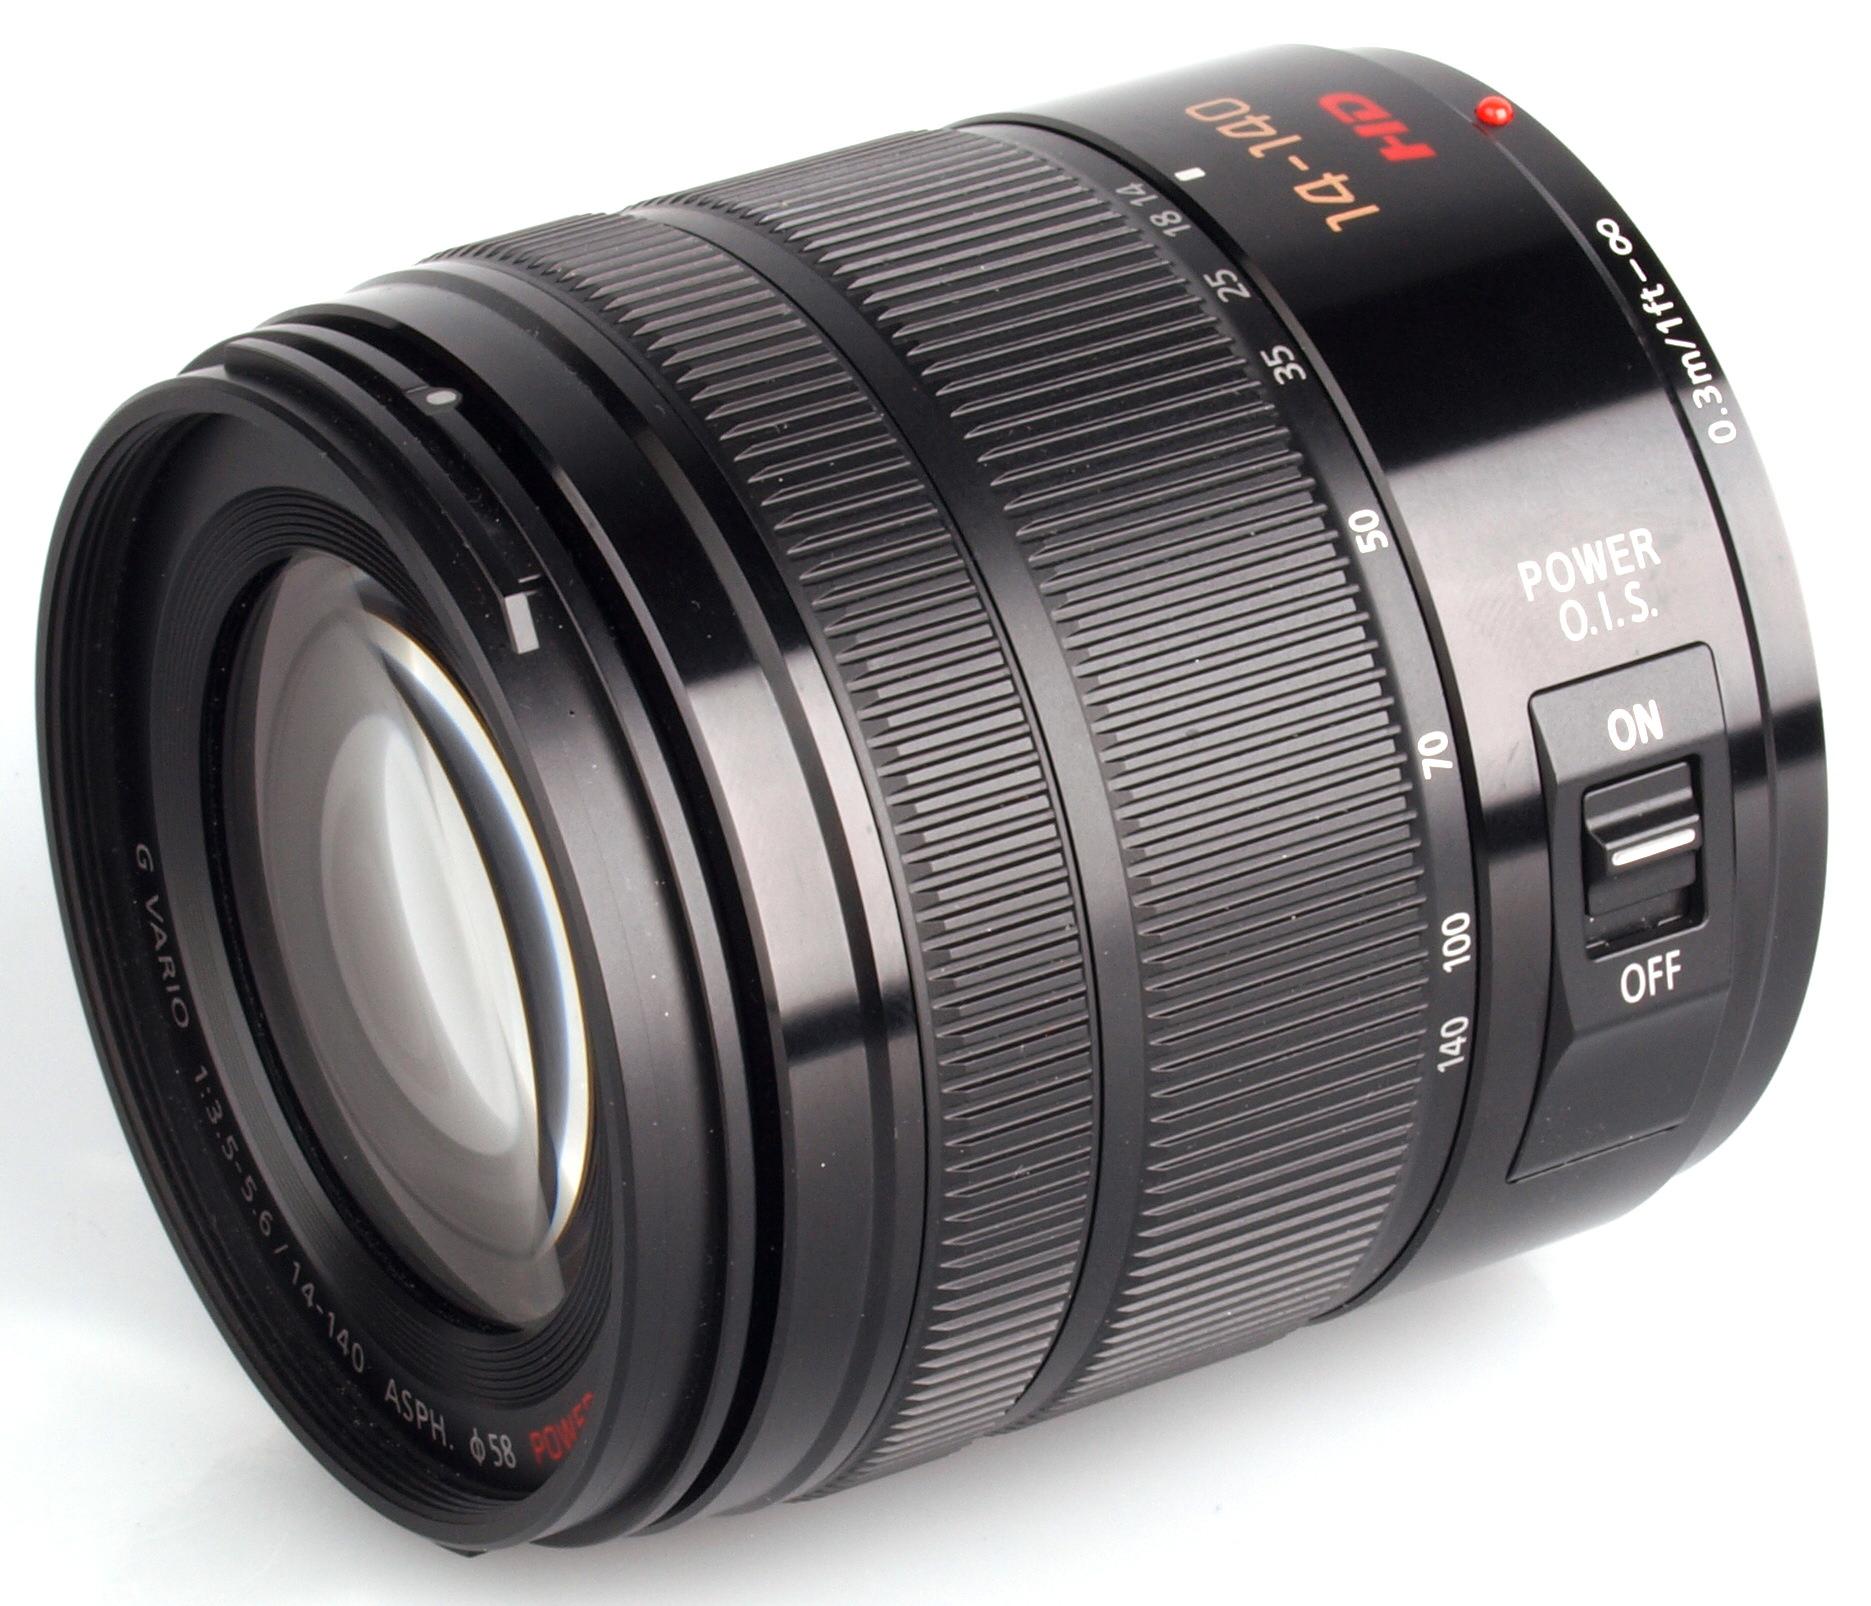 panasonic lumix g vario 14 140mm f 3 5 5 6 lens review